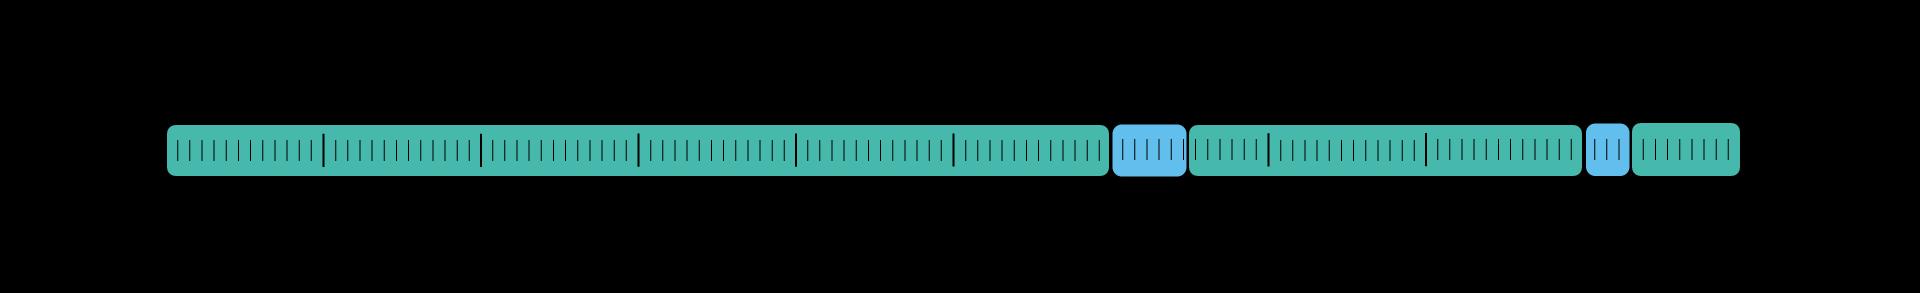 Arbeitszeitgesetz TimeTrack Lexikon